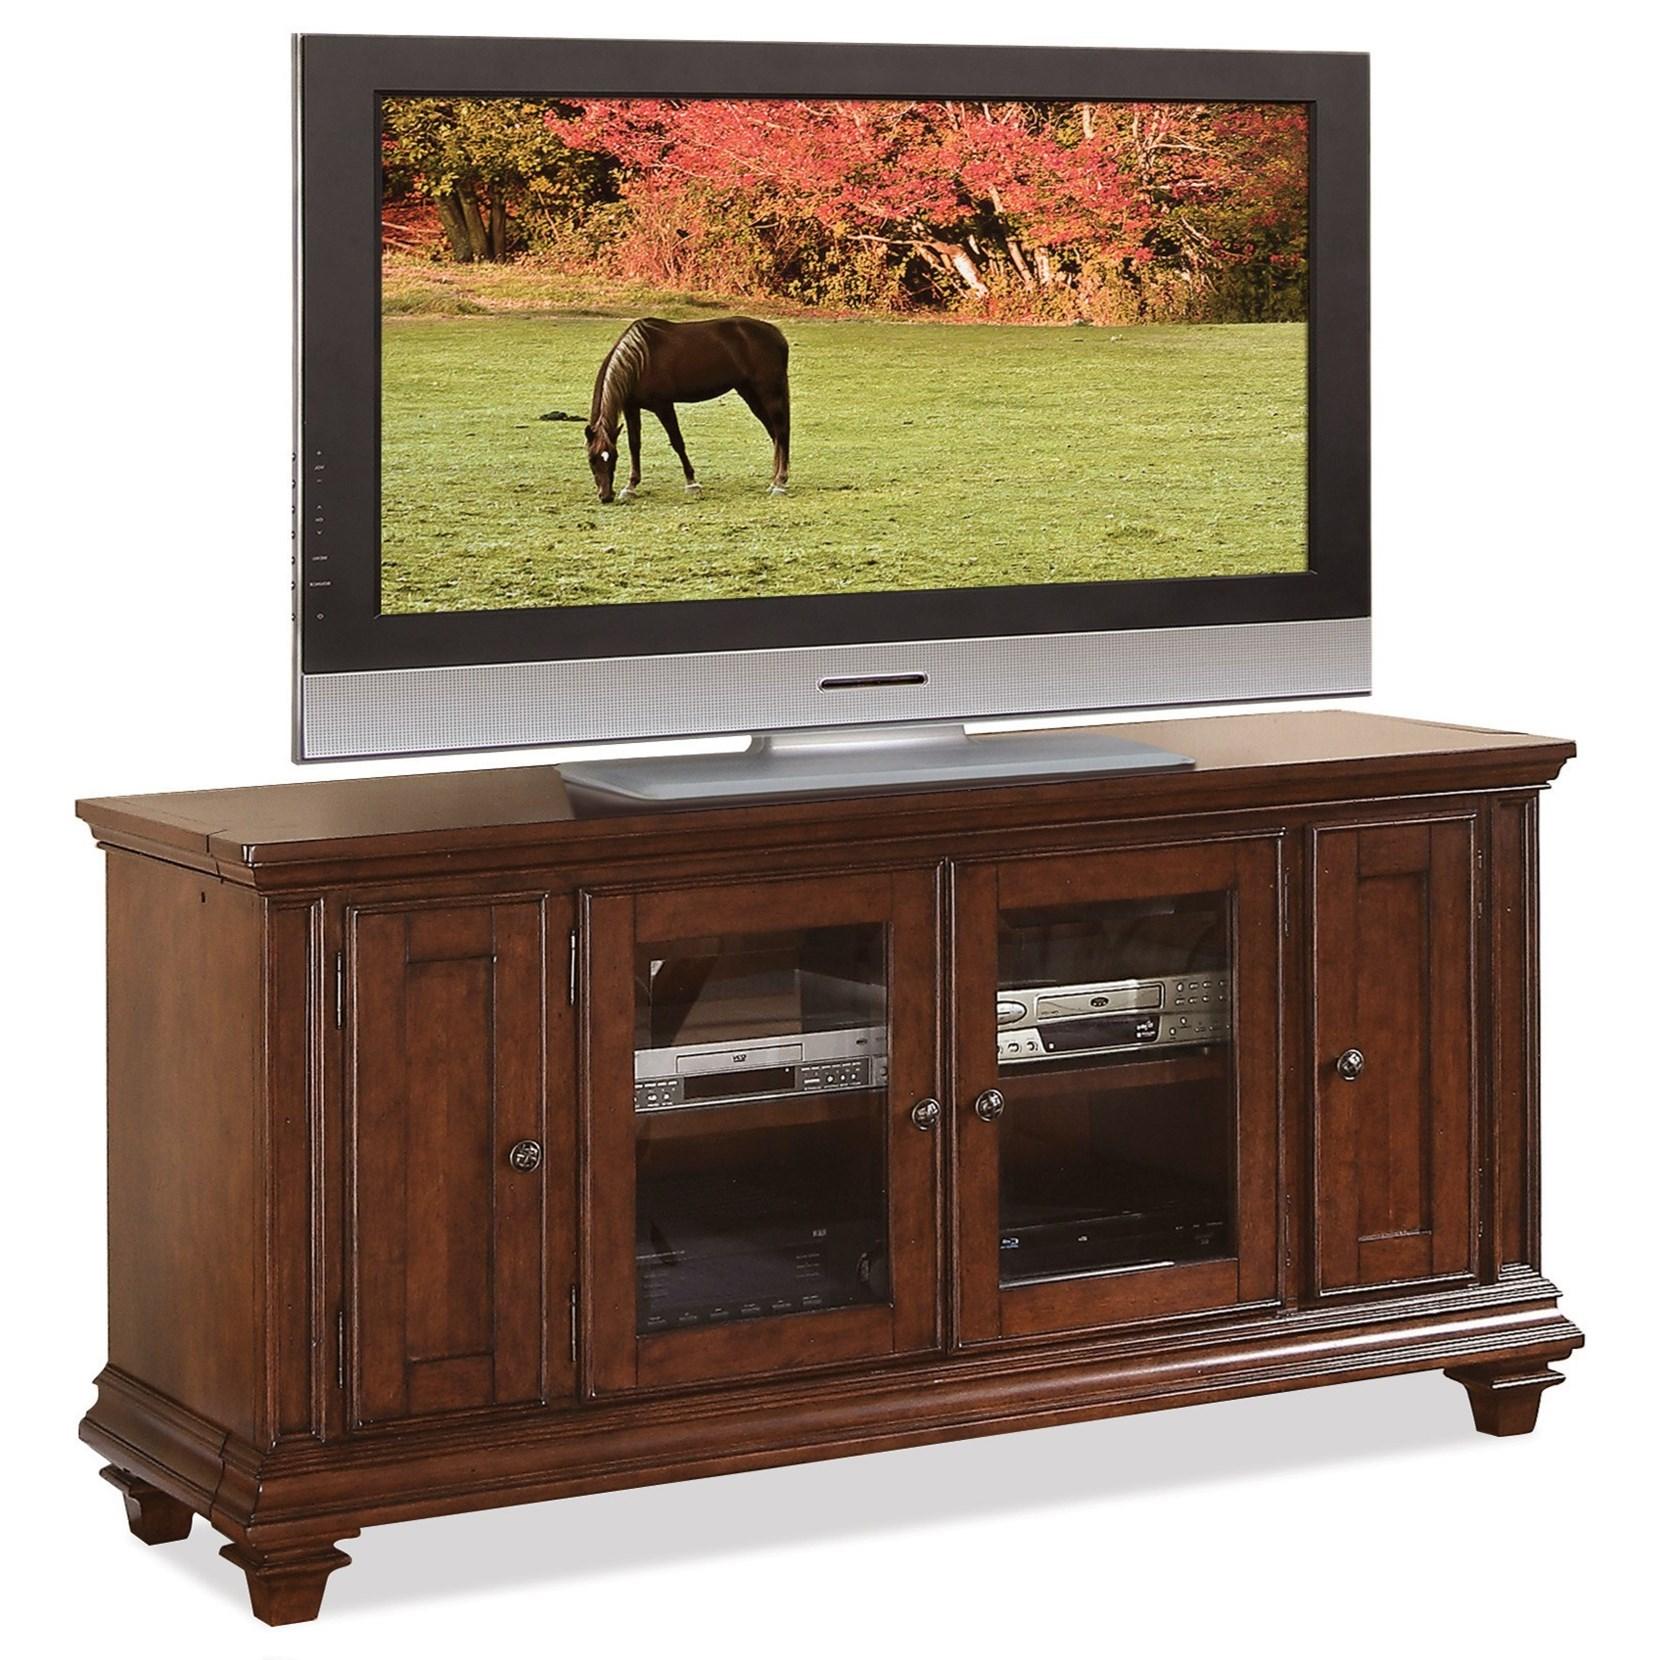 Riverside Furniture Windward Bay 63 Inch TV Console - Item Number: 42840